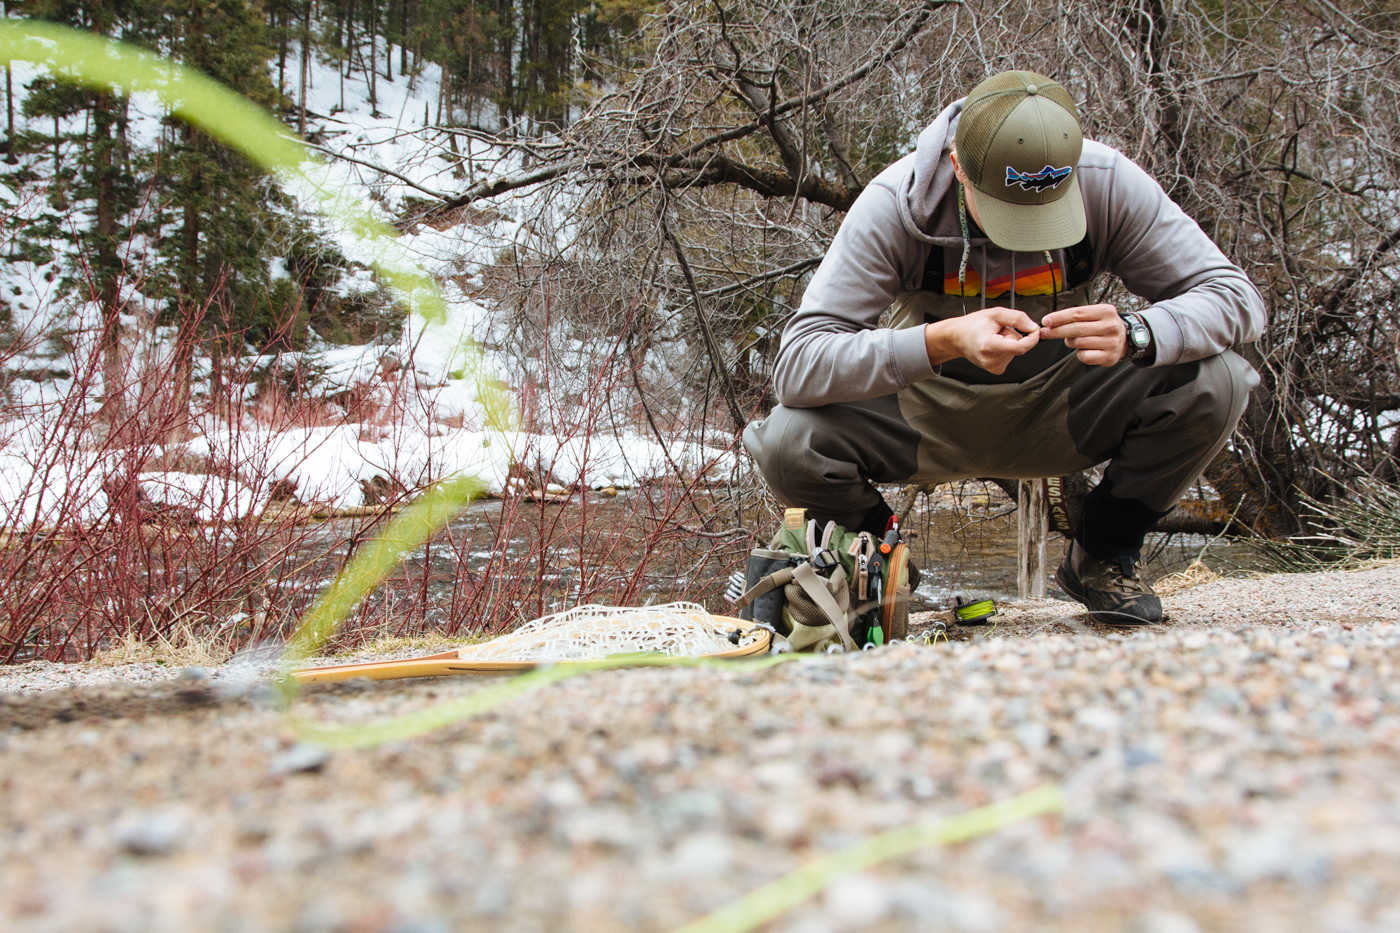 Rigging up...everyones' favorite part of fishing